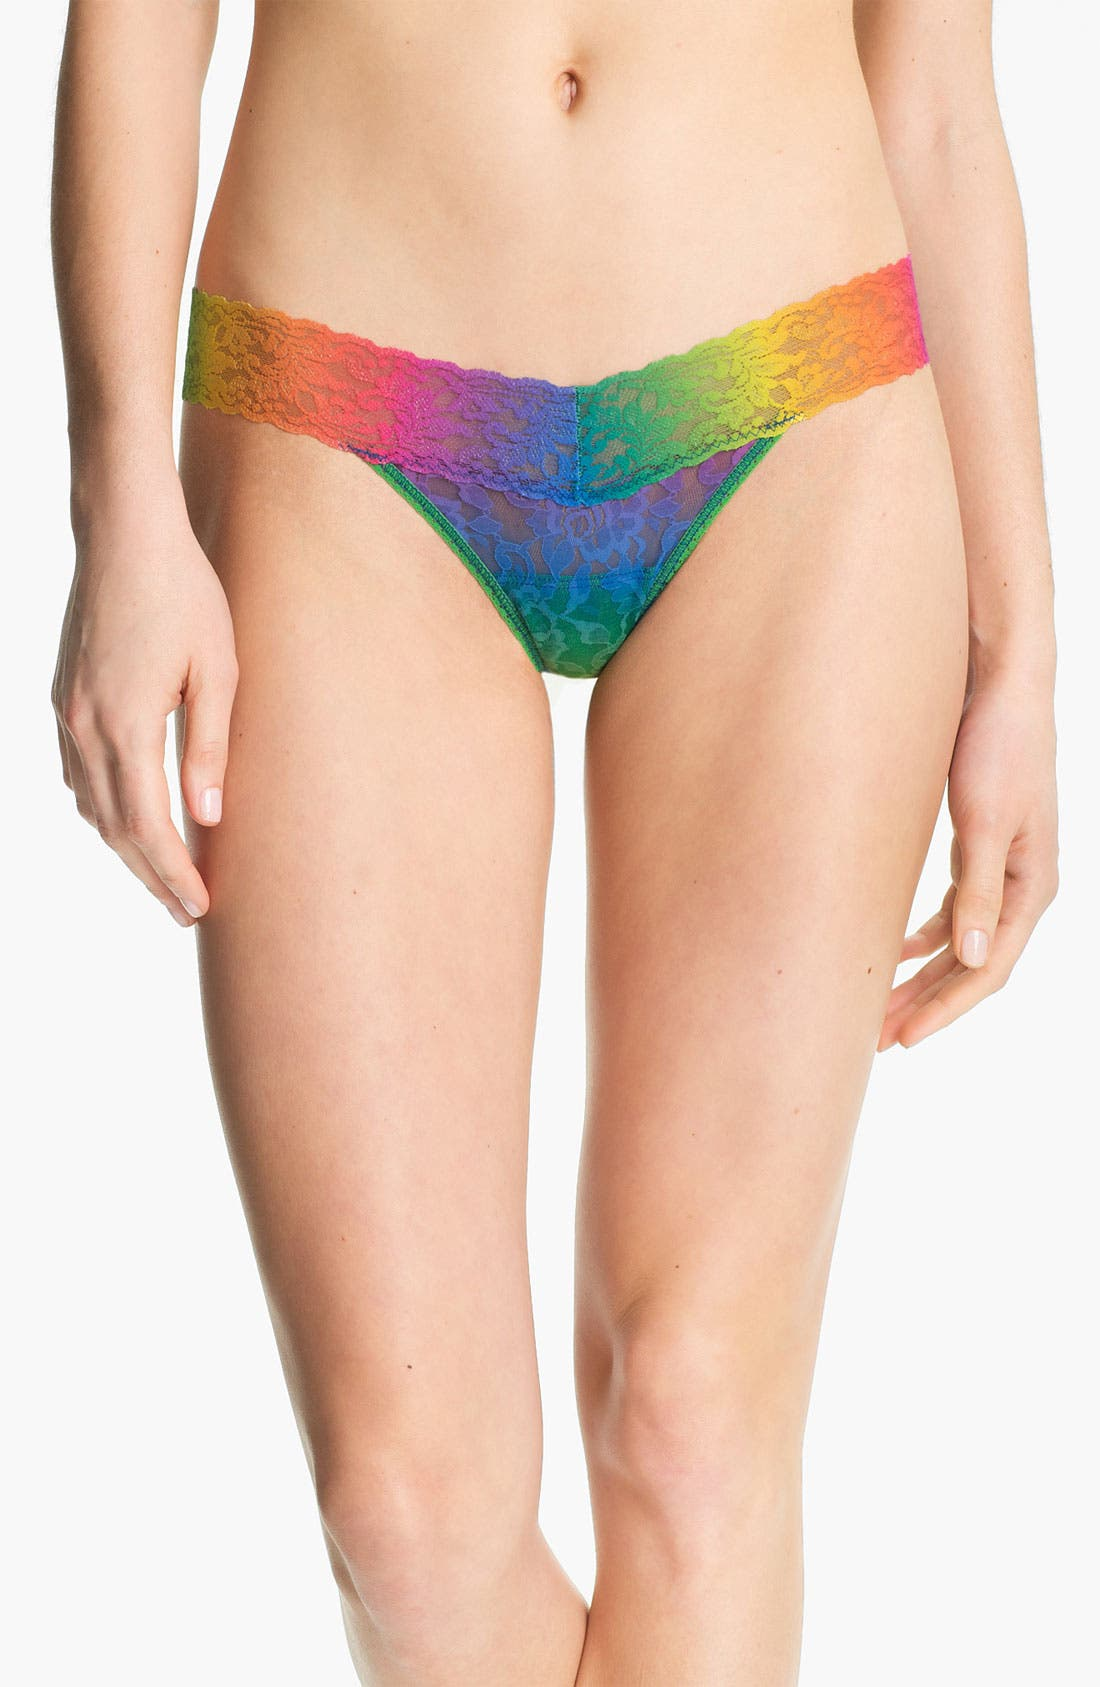 Main Image - Hanky Panky 'Rainbow' Low Rise Thong